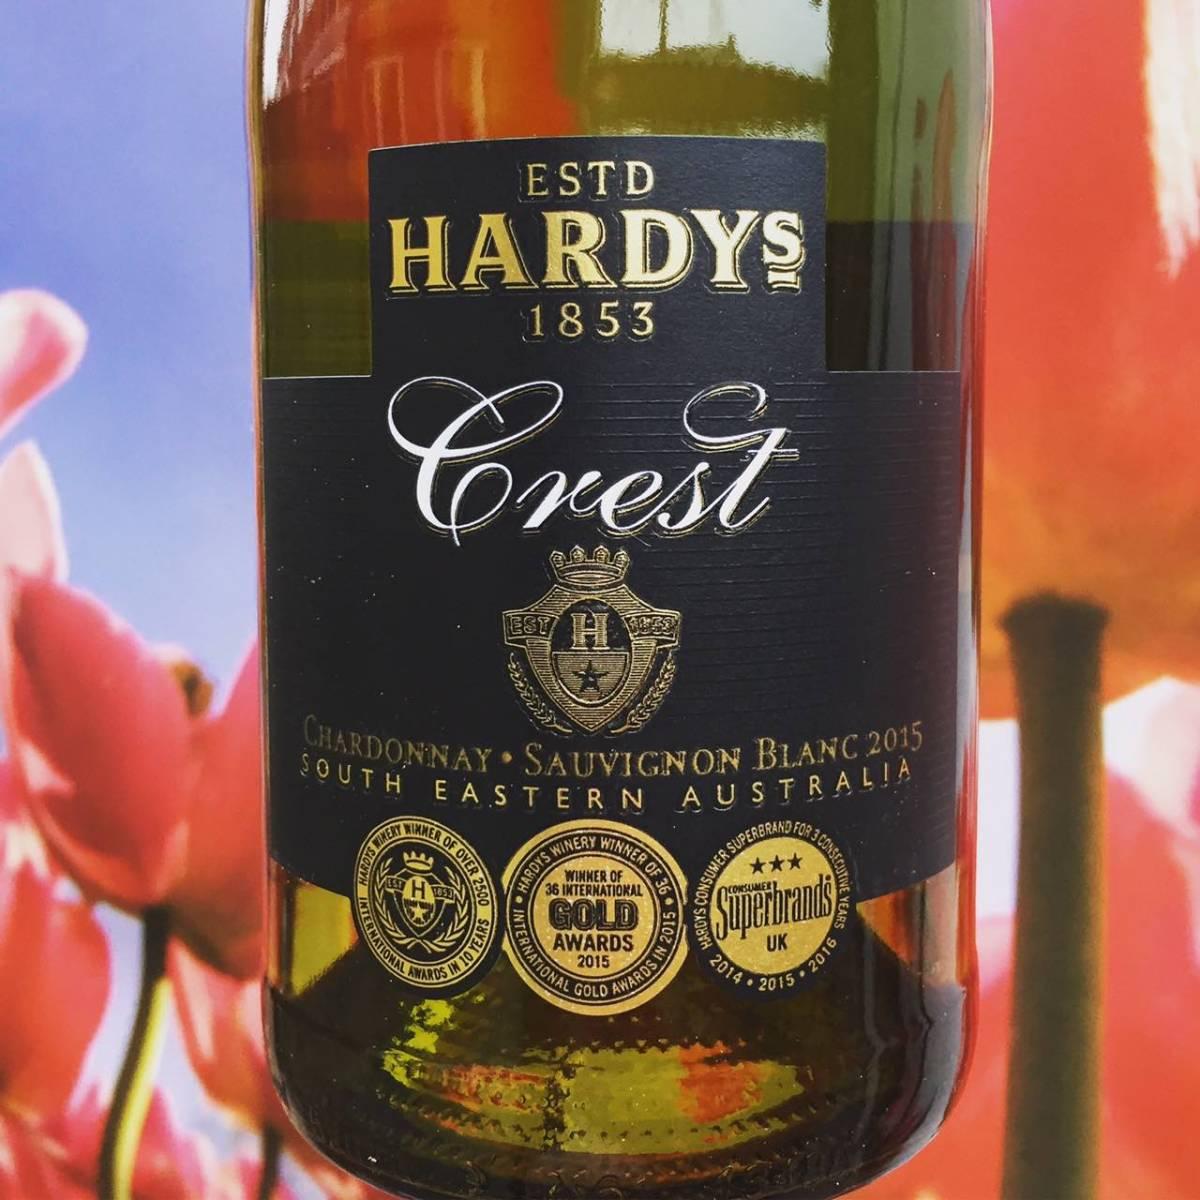 Hardy's Crest, Chardonnay - Sauvignon Blanc